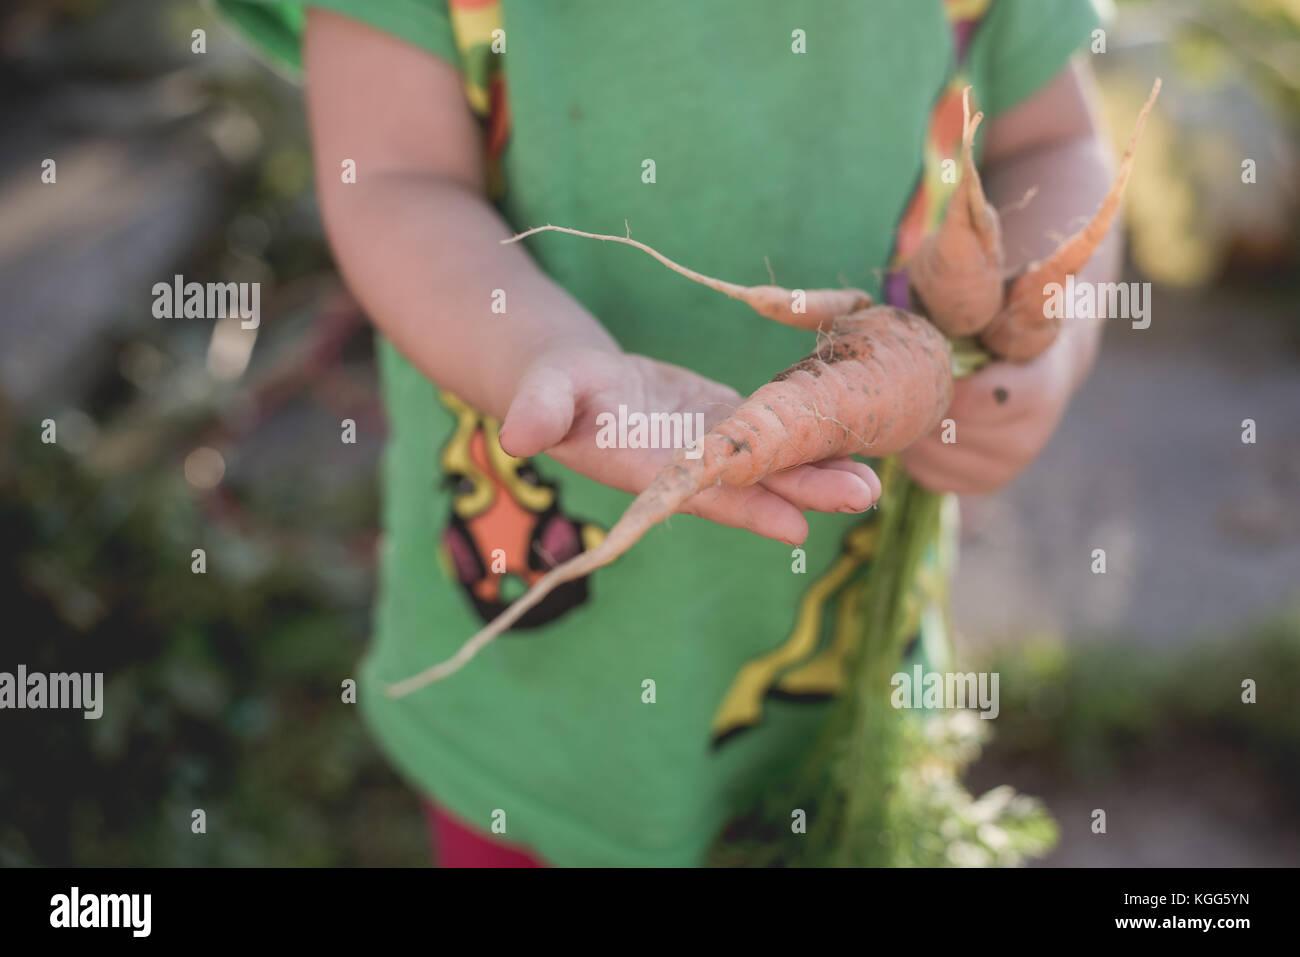 Toddler holding carrots frais hors d'un jardin Photo Stock